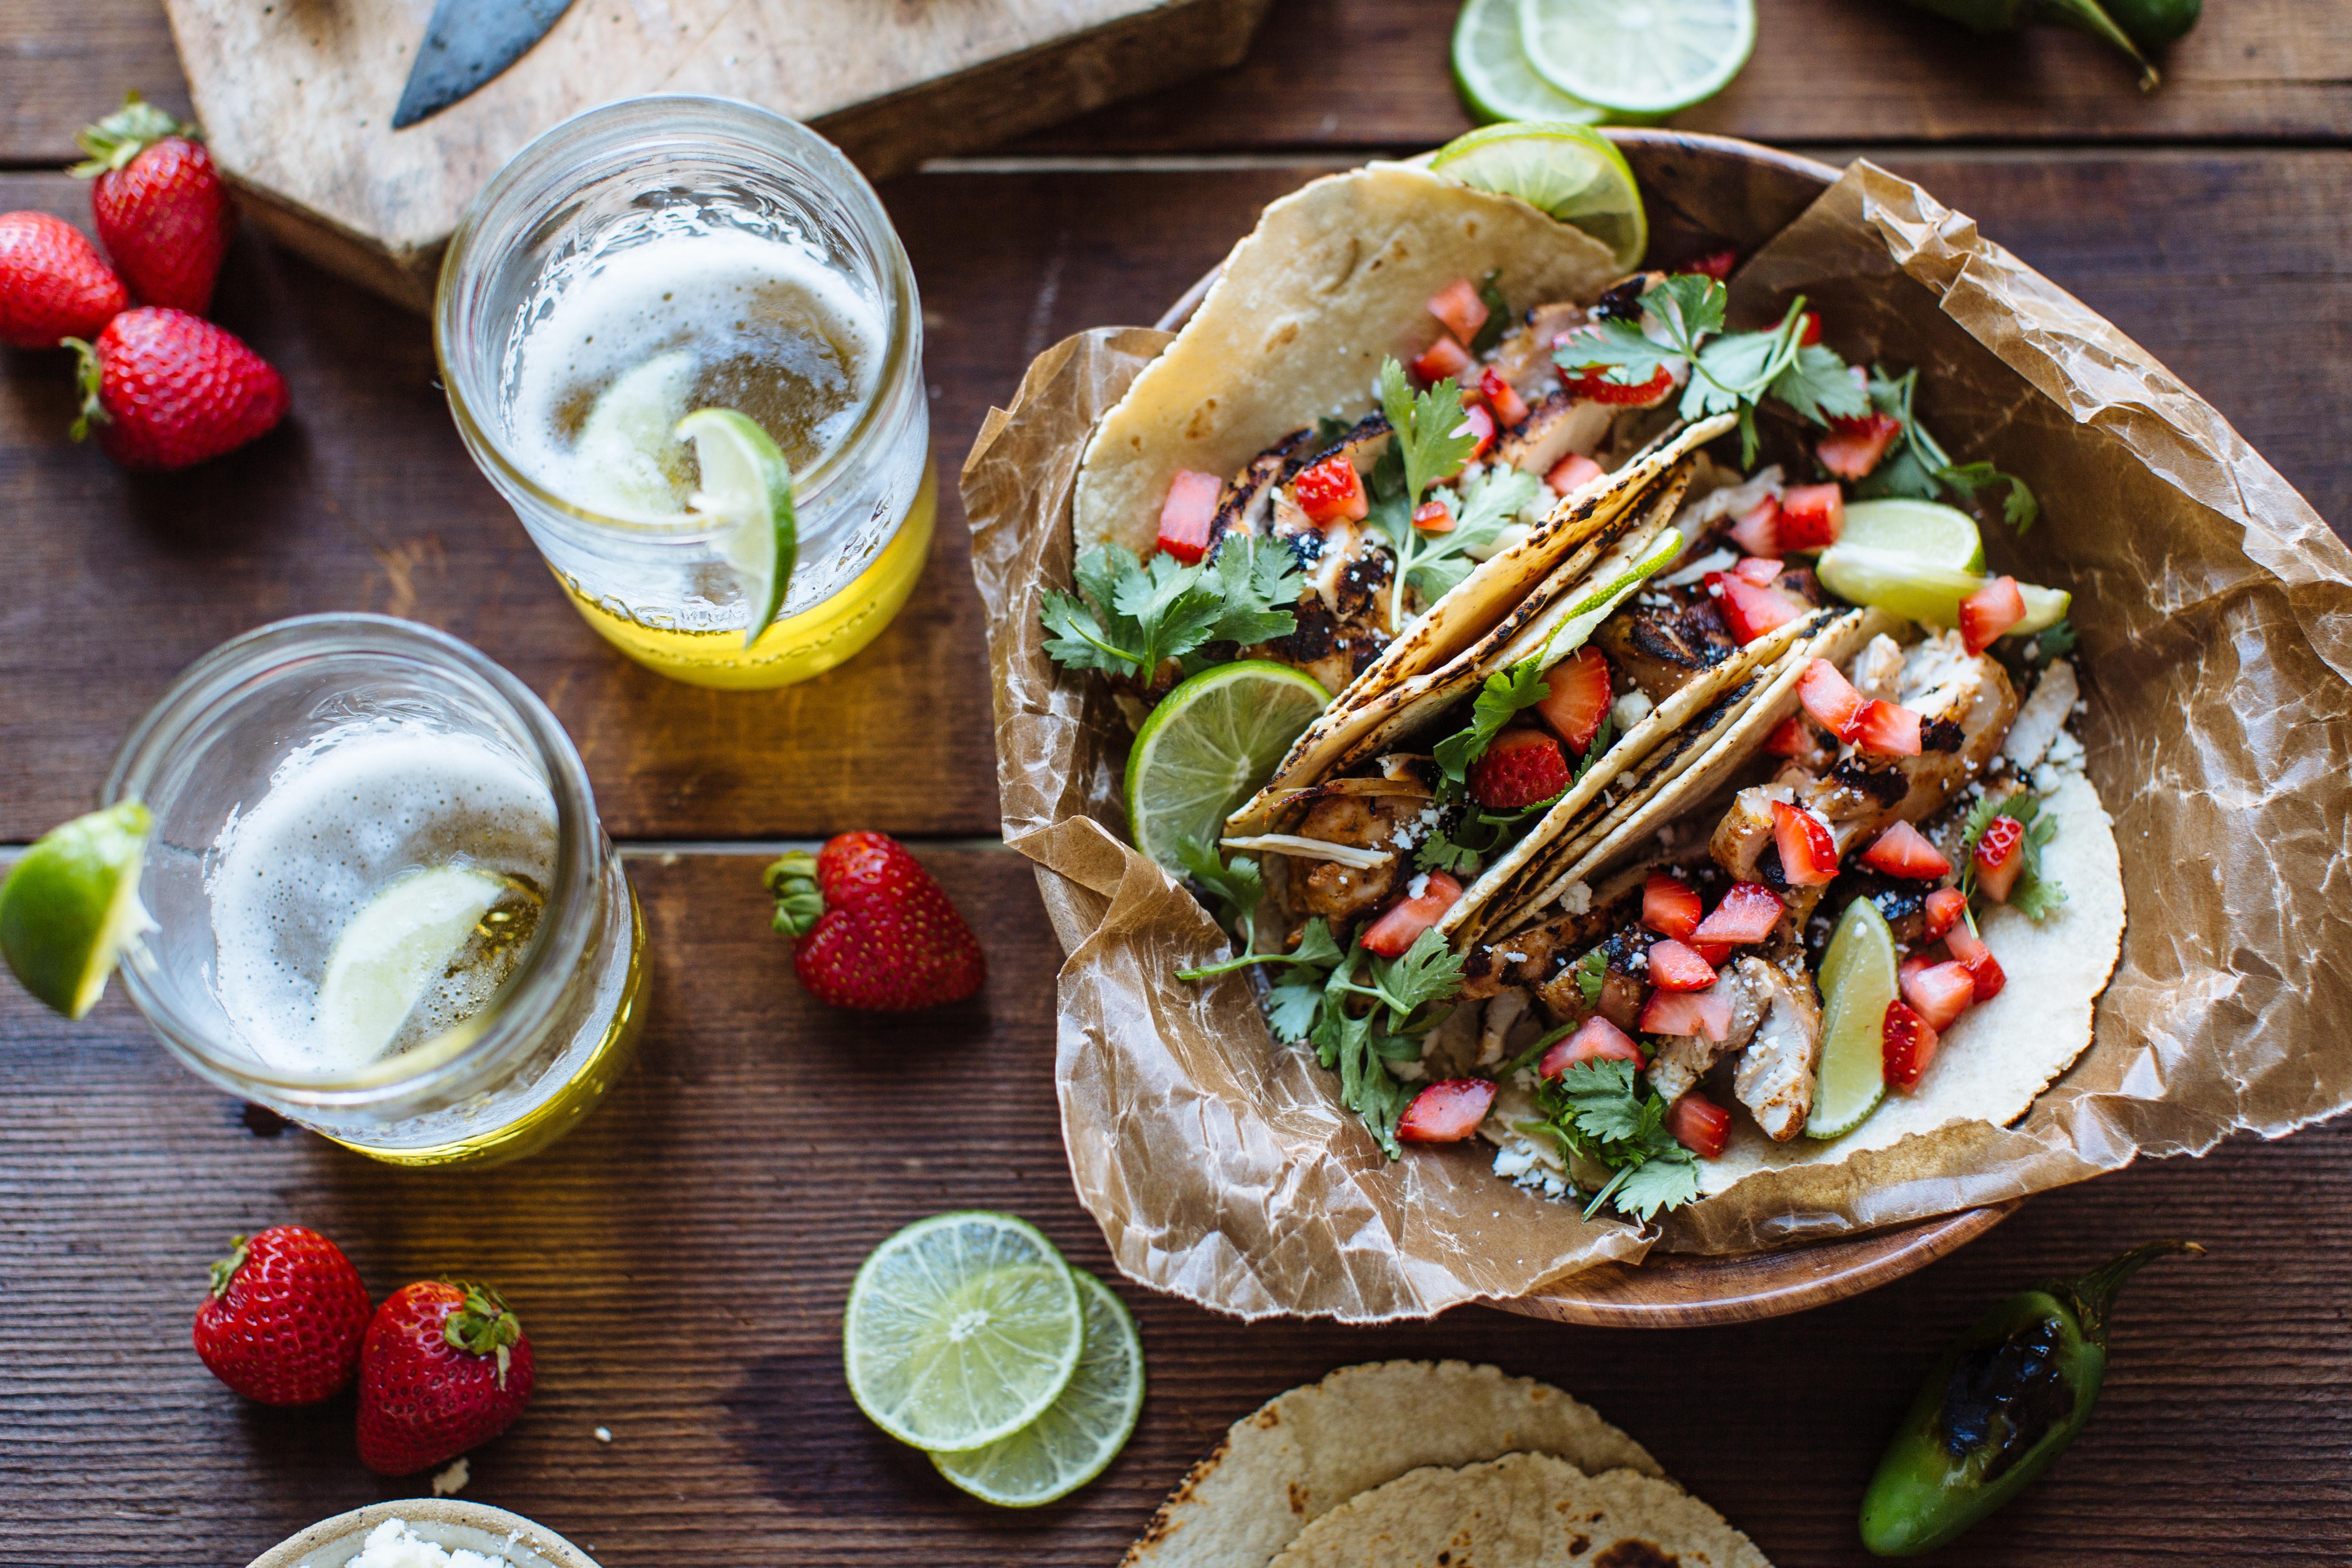 Strawberry & Paprika Chicken Fajitas